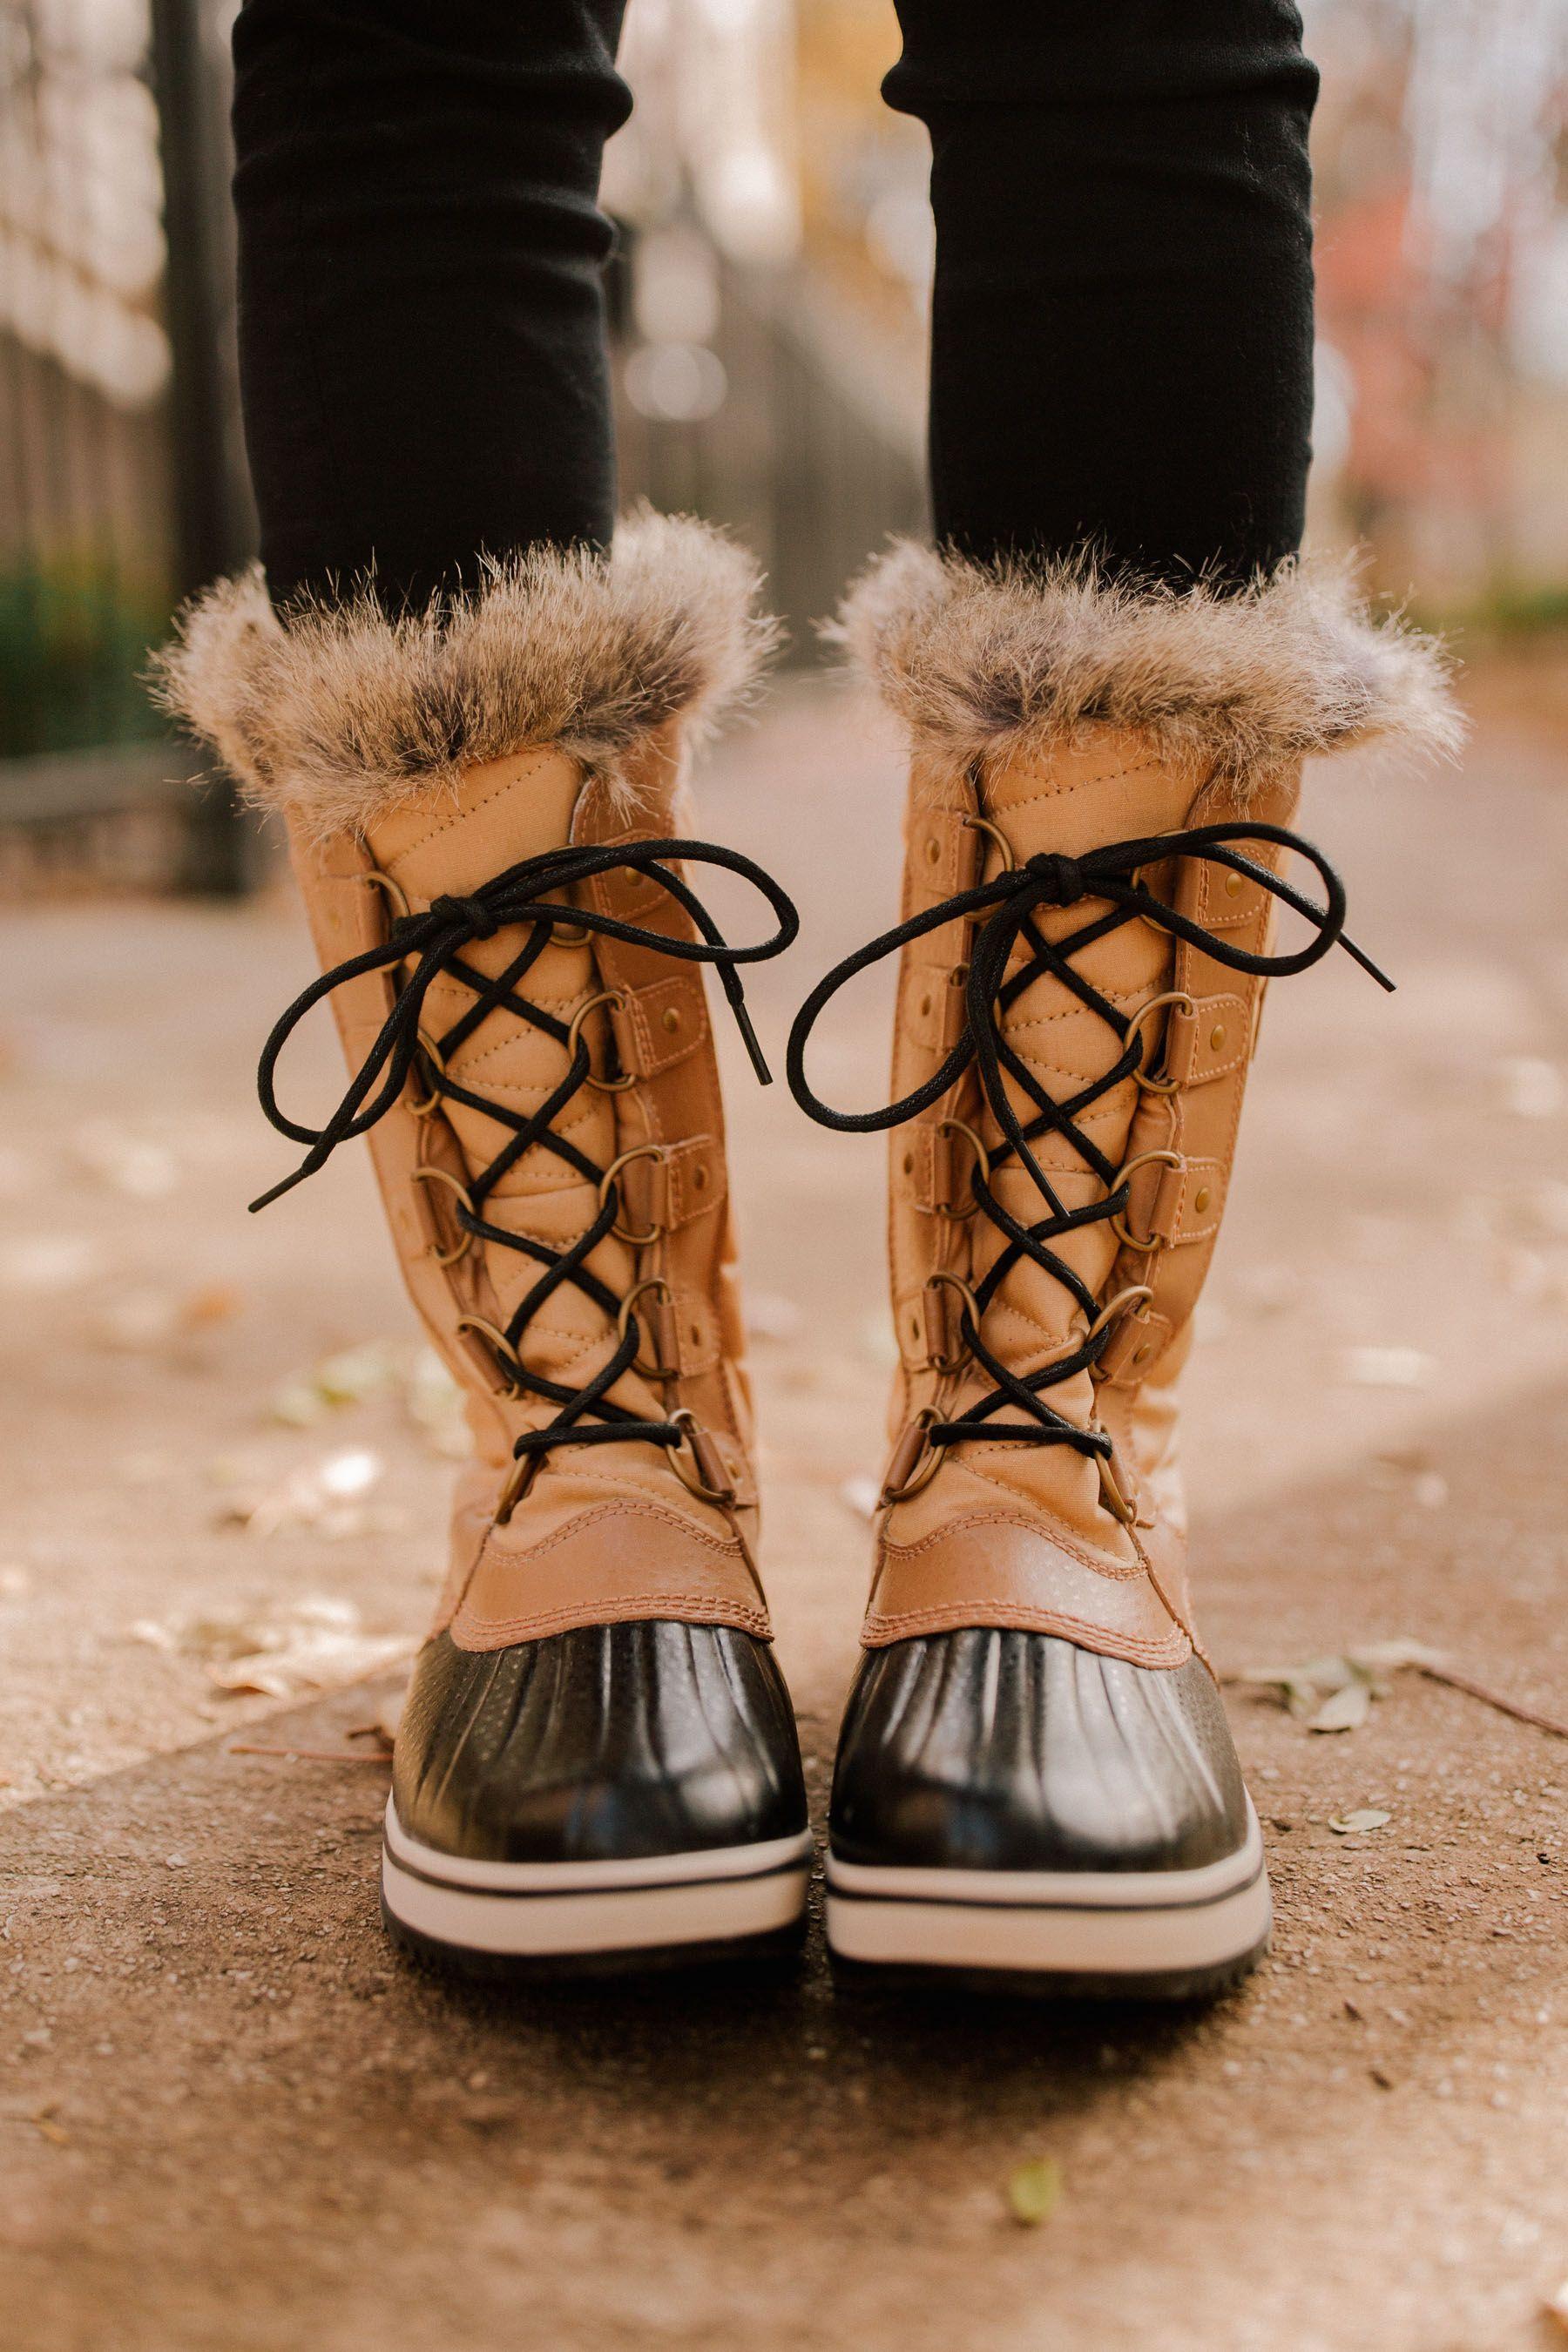 Sorel Tofino II Boots - Kelly in the City